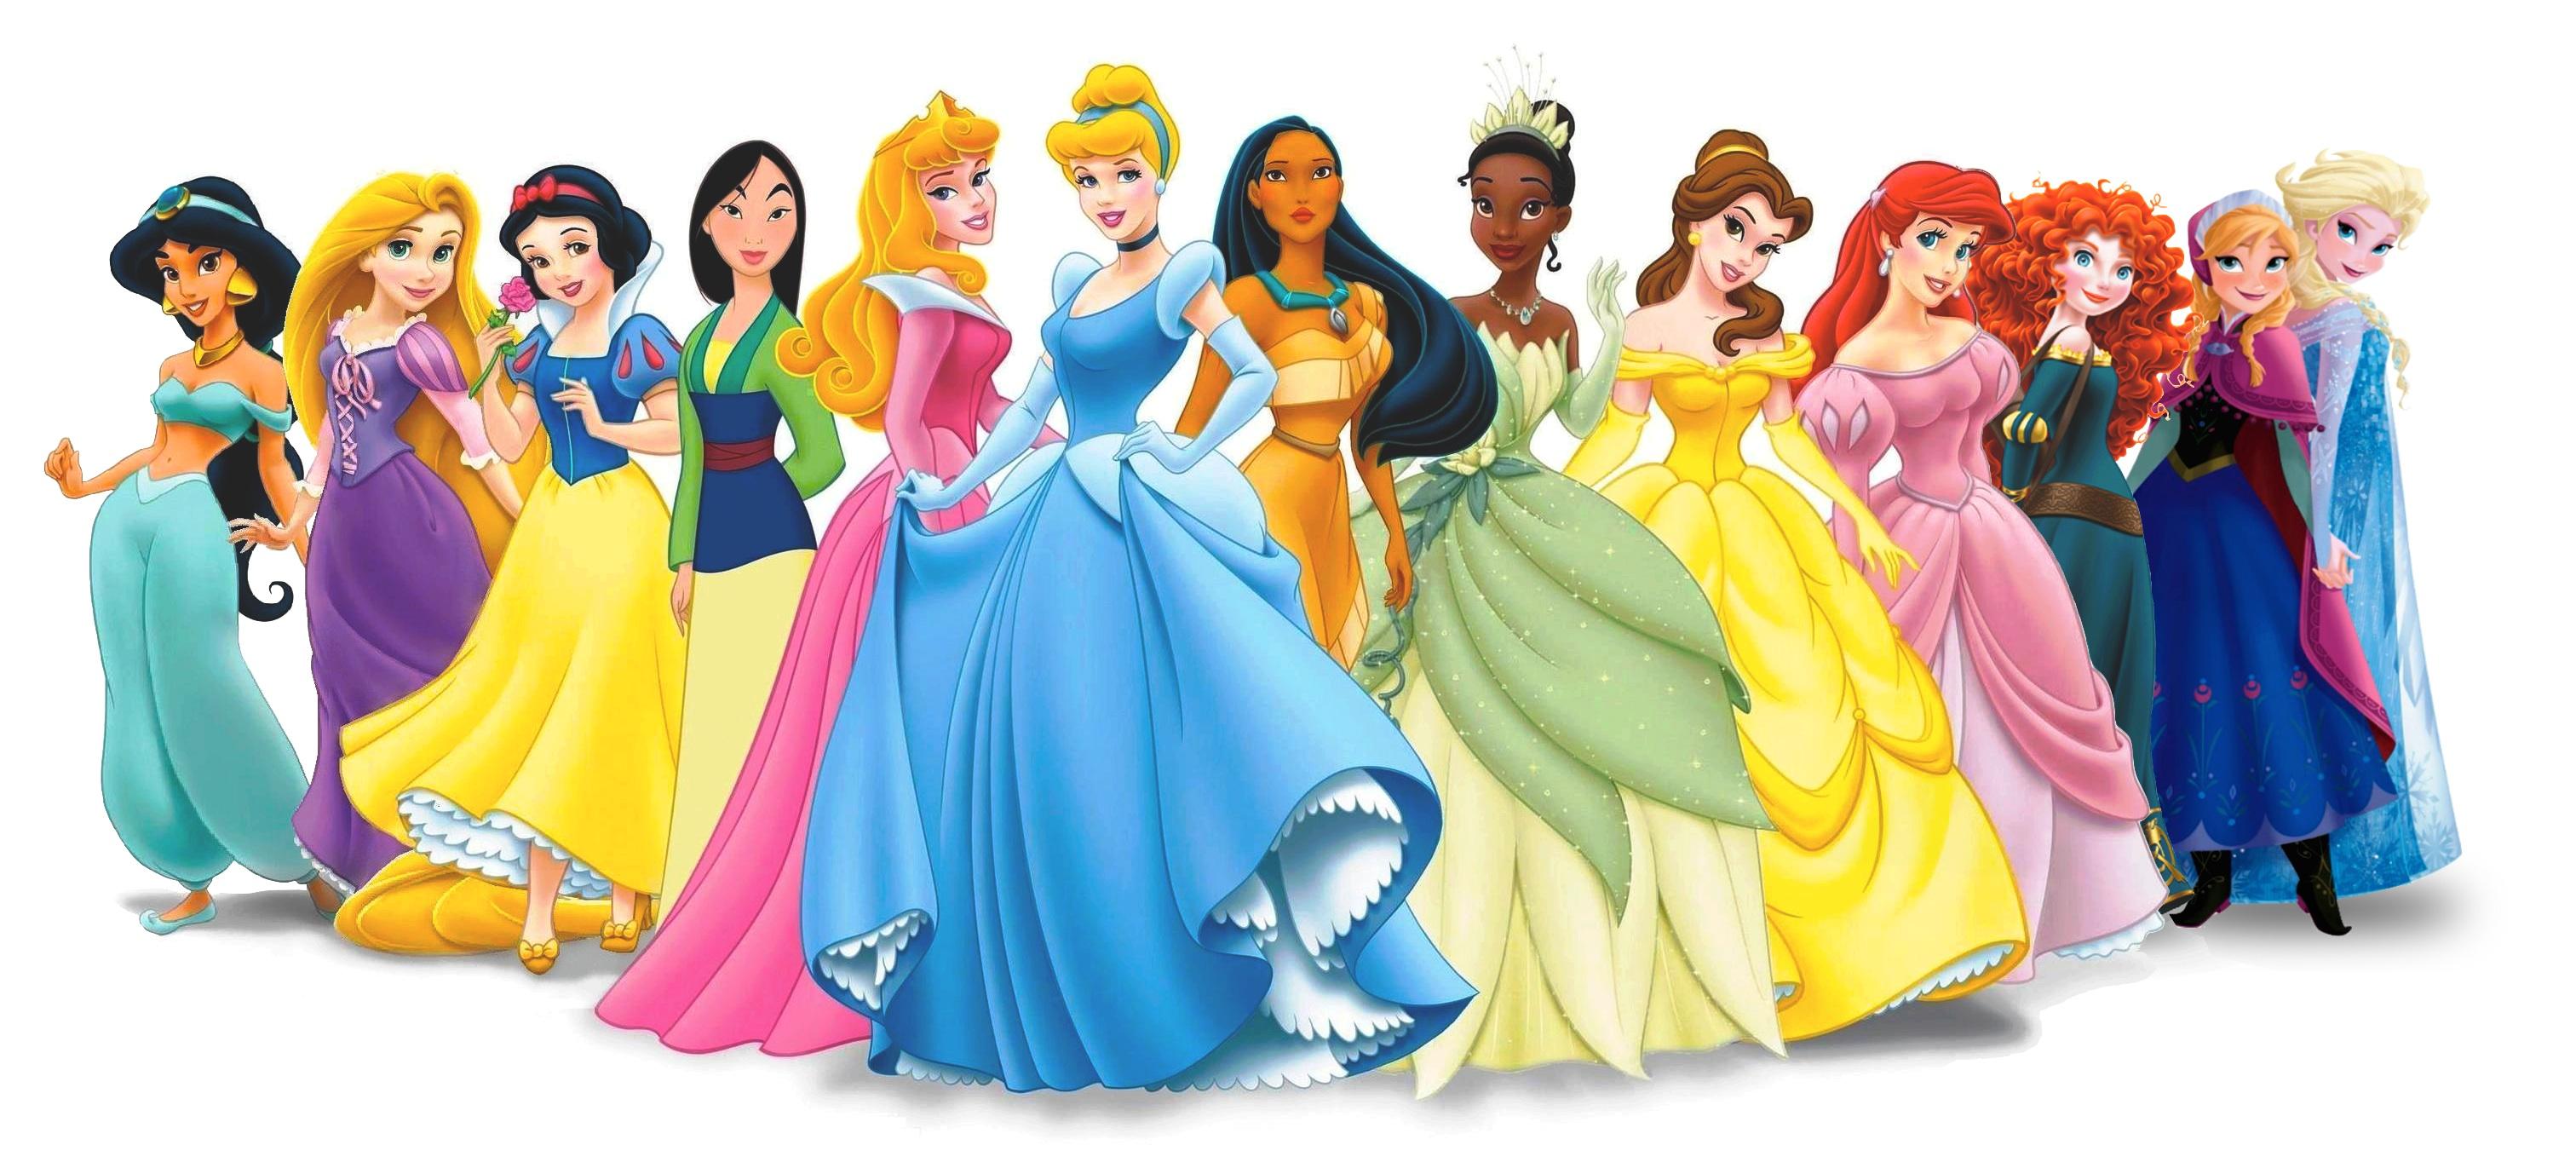 Disney Princess Image Disney